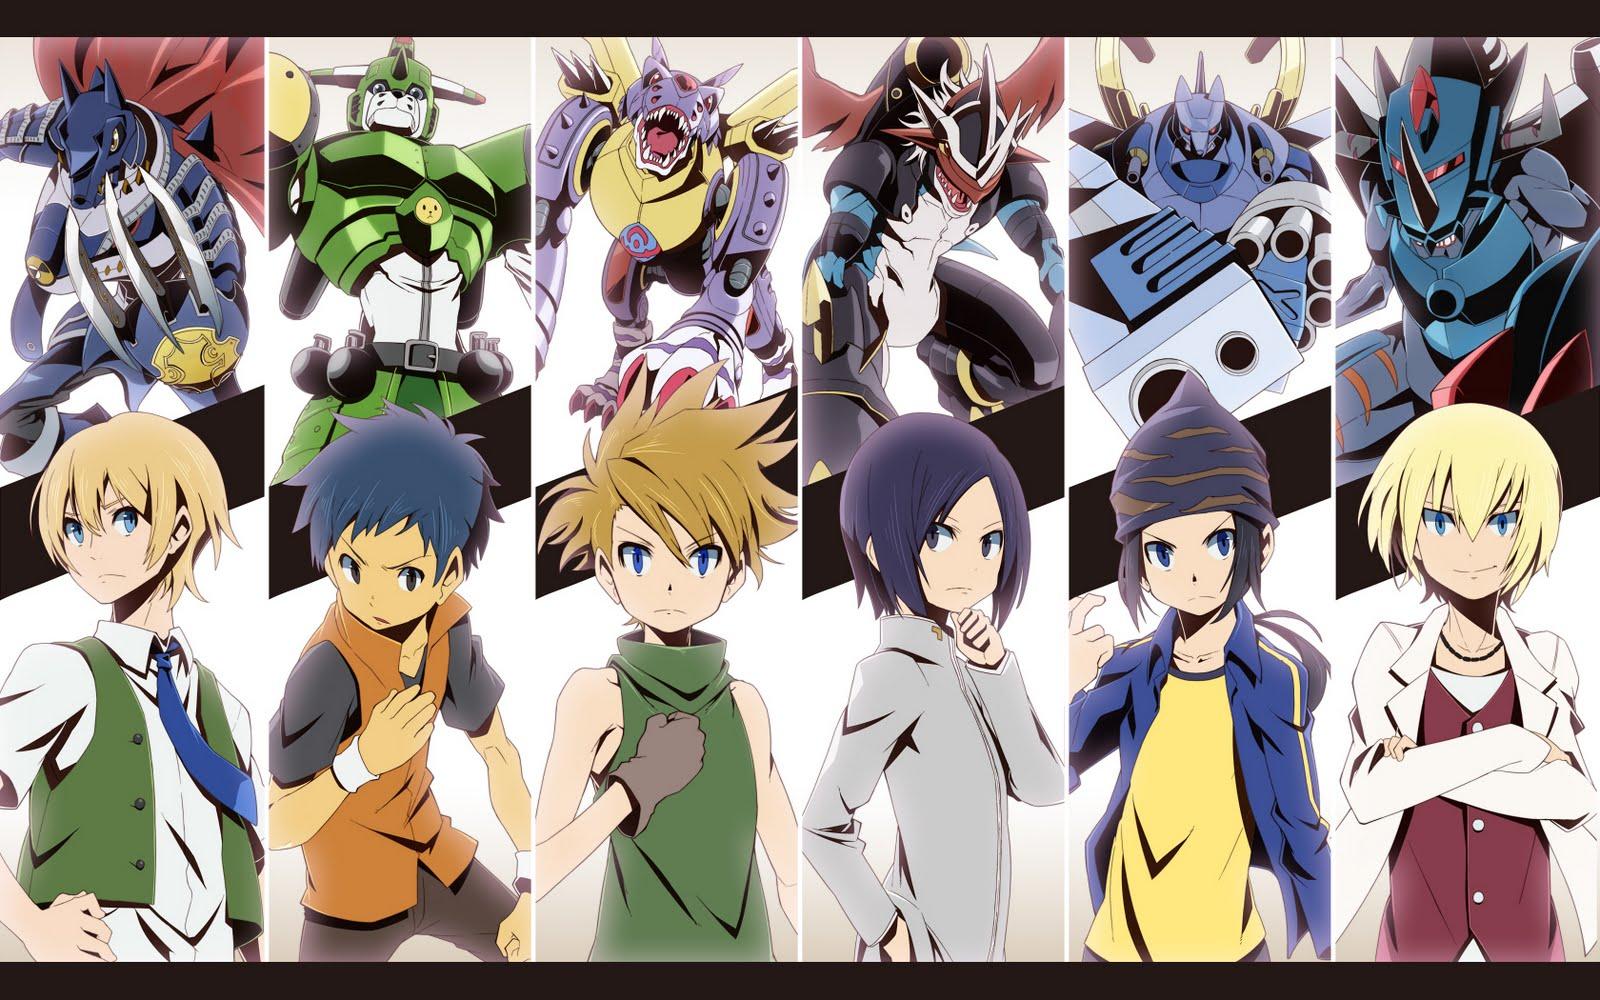 Tags%3A+Digimon+Zero+2%2C+Digimon%2C+Digimon+Adventures%2C+Ken ...